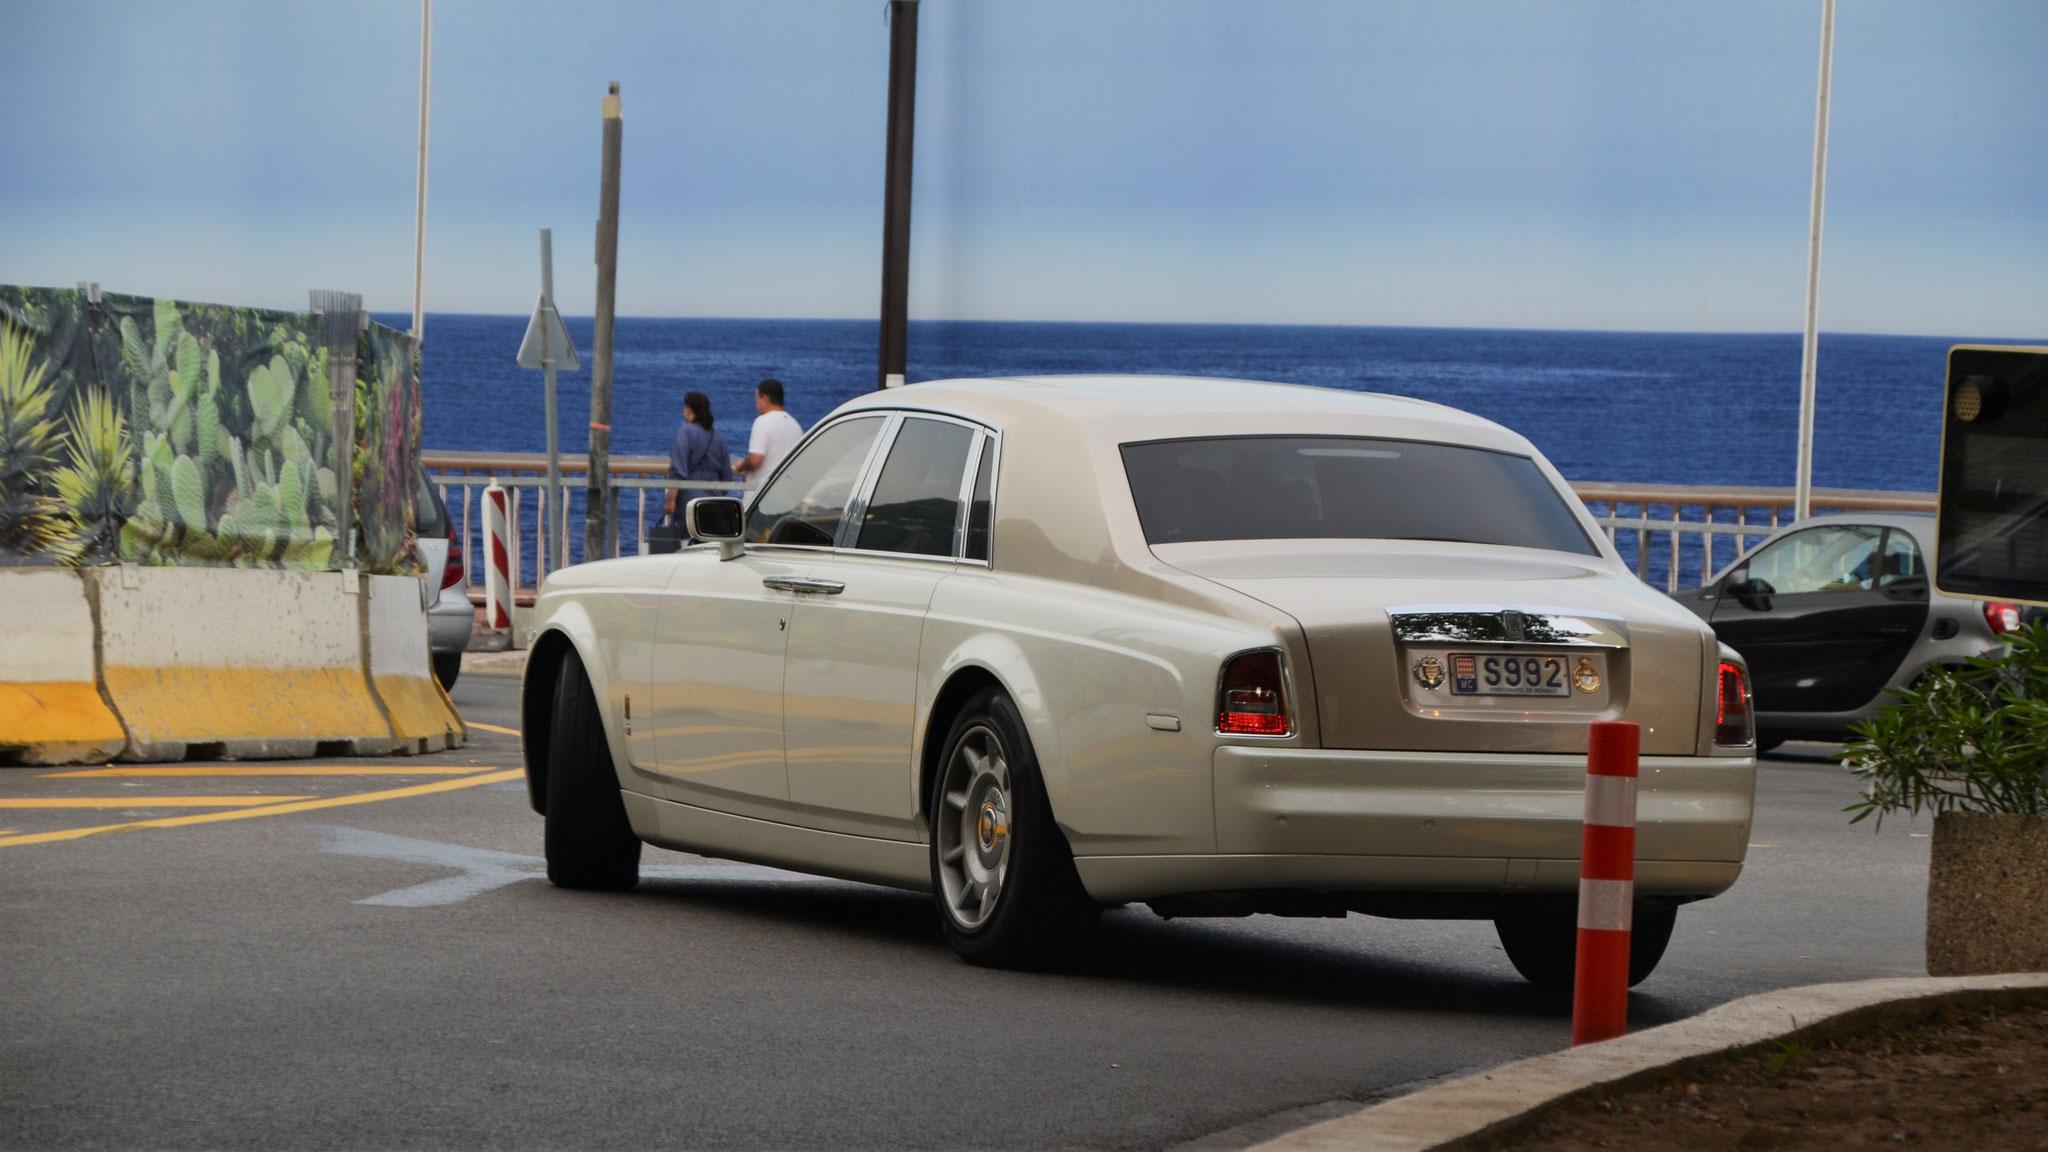 Rolls Royce Phantom - S992 (MC)